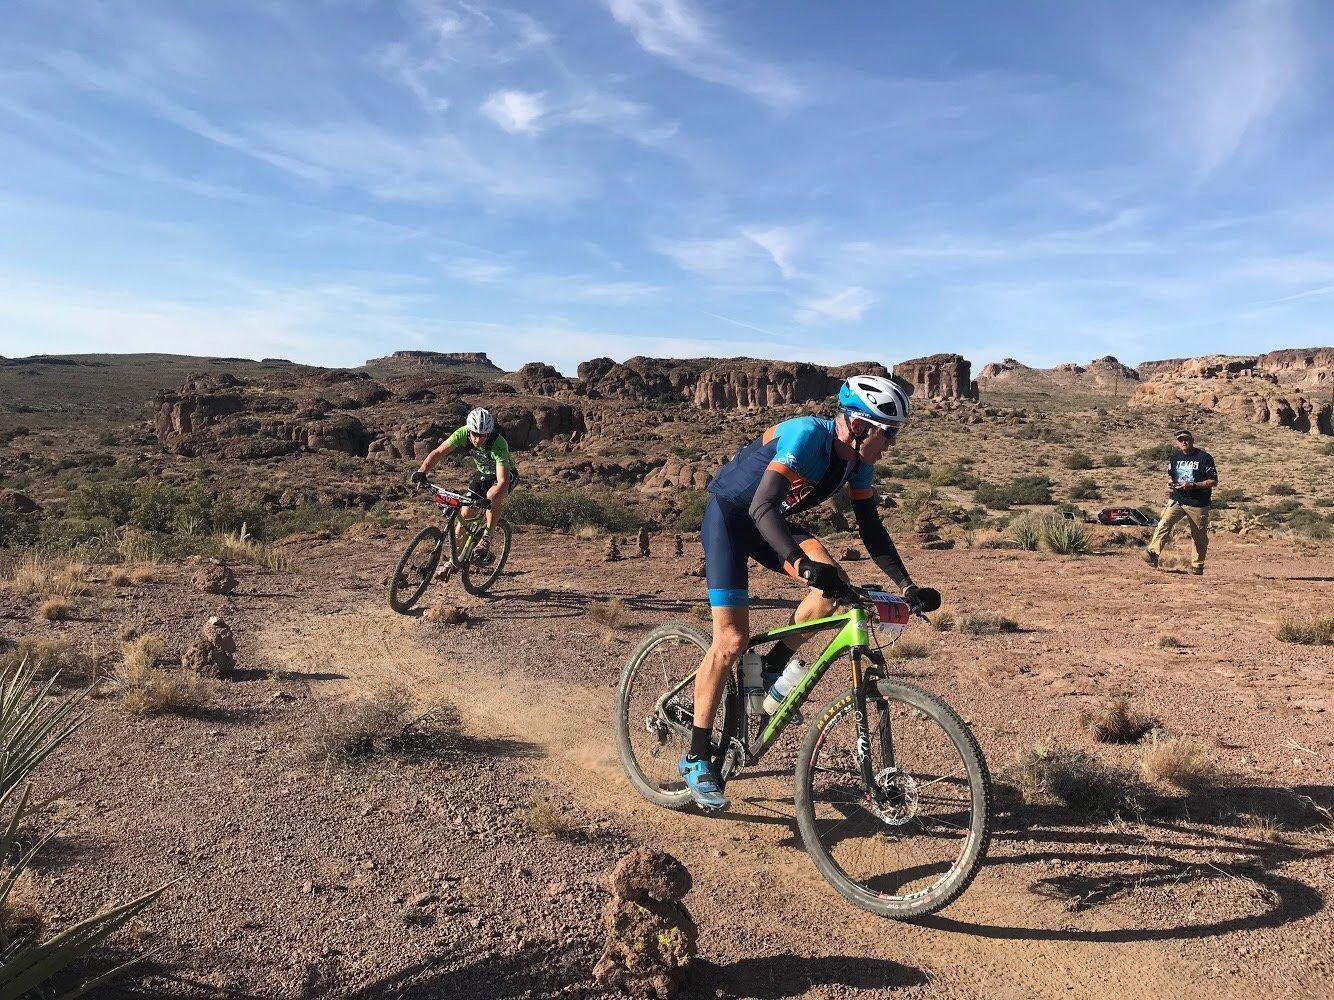 Rattler Race Shows Off Endurance Among Cyclists